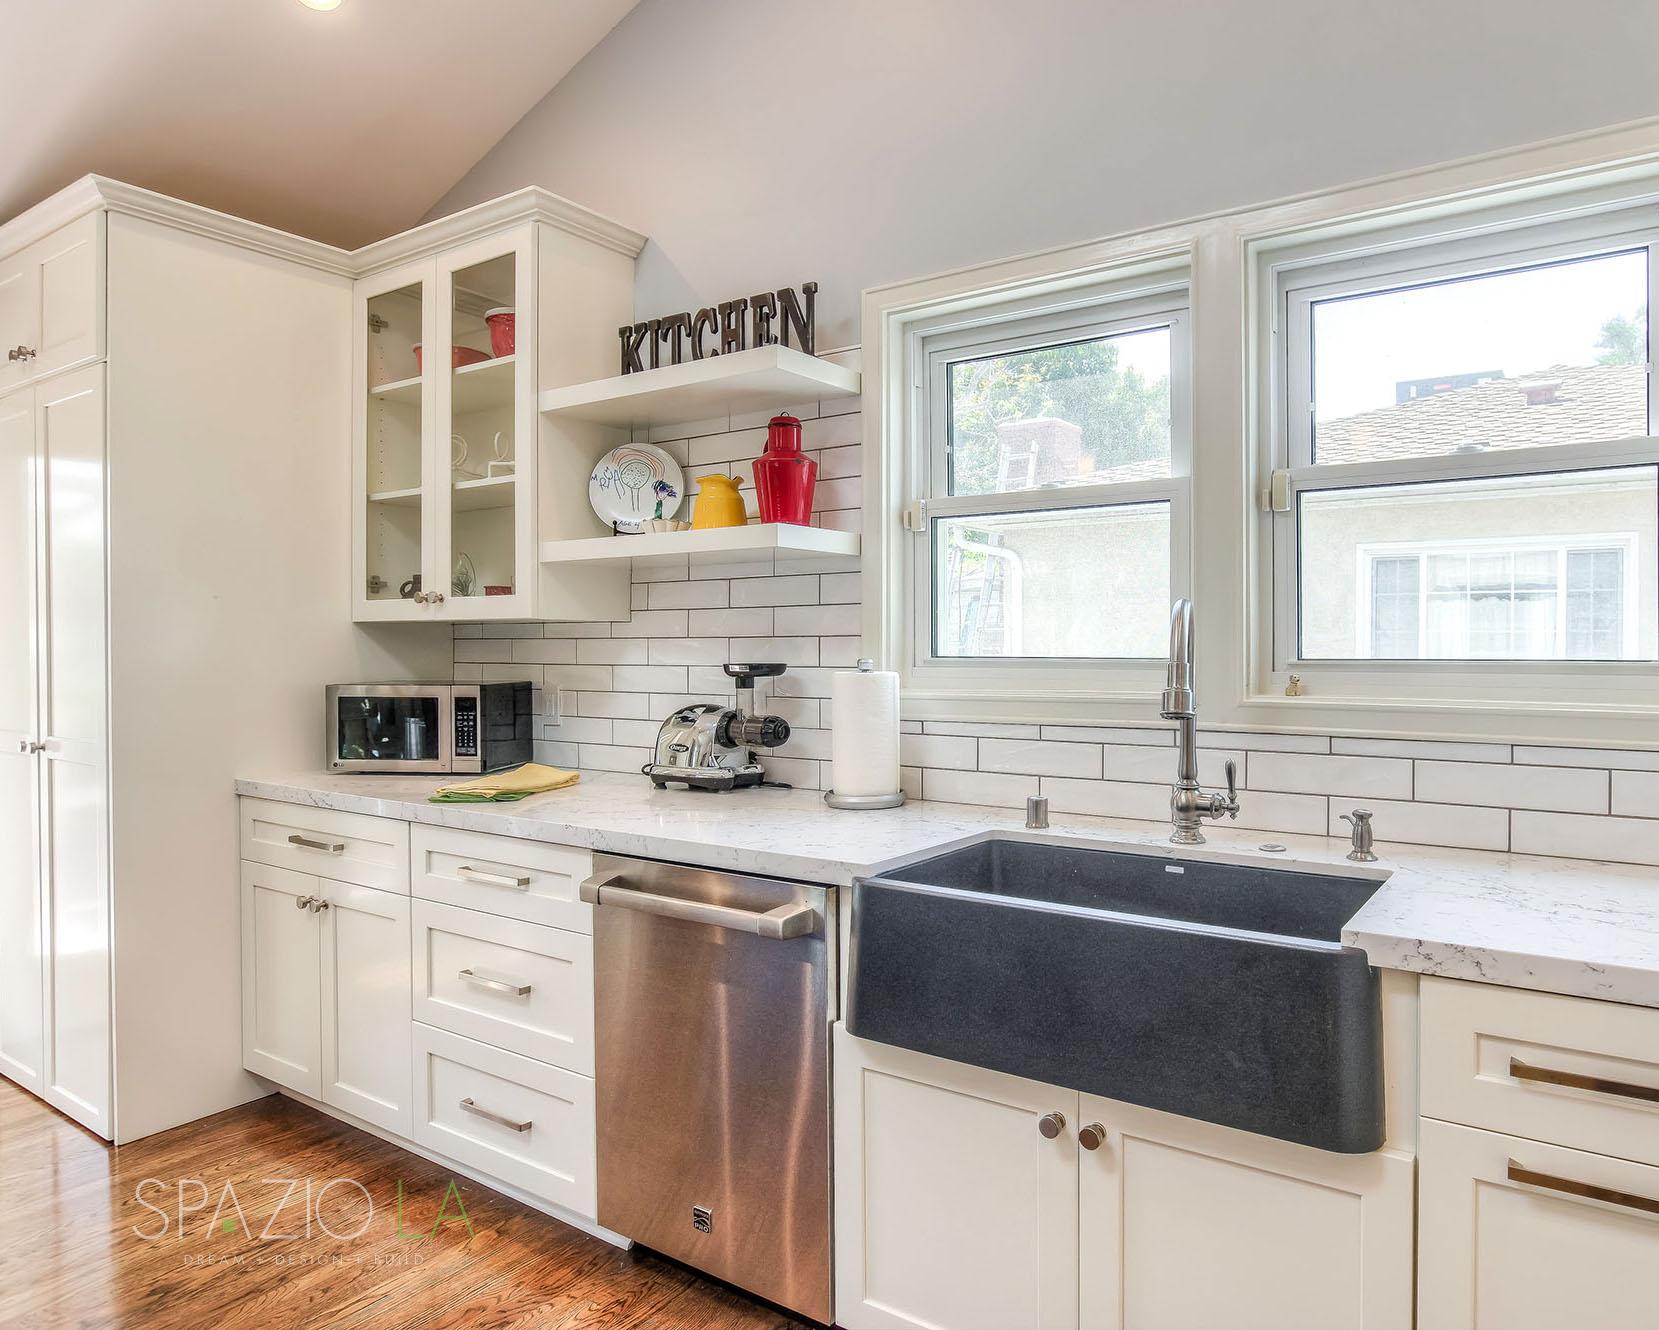 Custom shaker cabinets, white Caesarstone quartz countertops, Bosch appliances and farmhouse style Blanco sink.